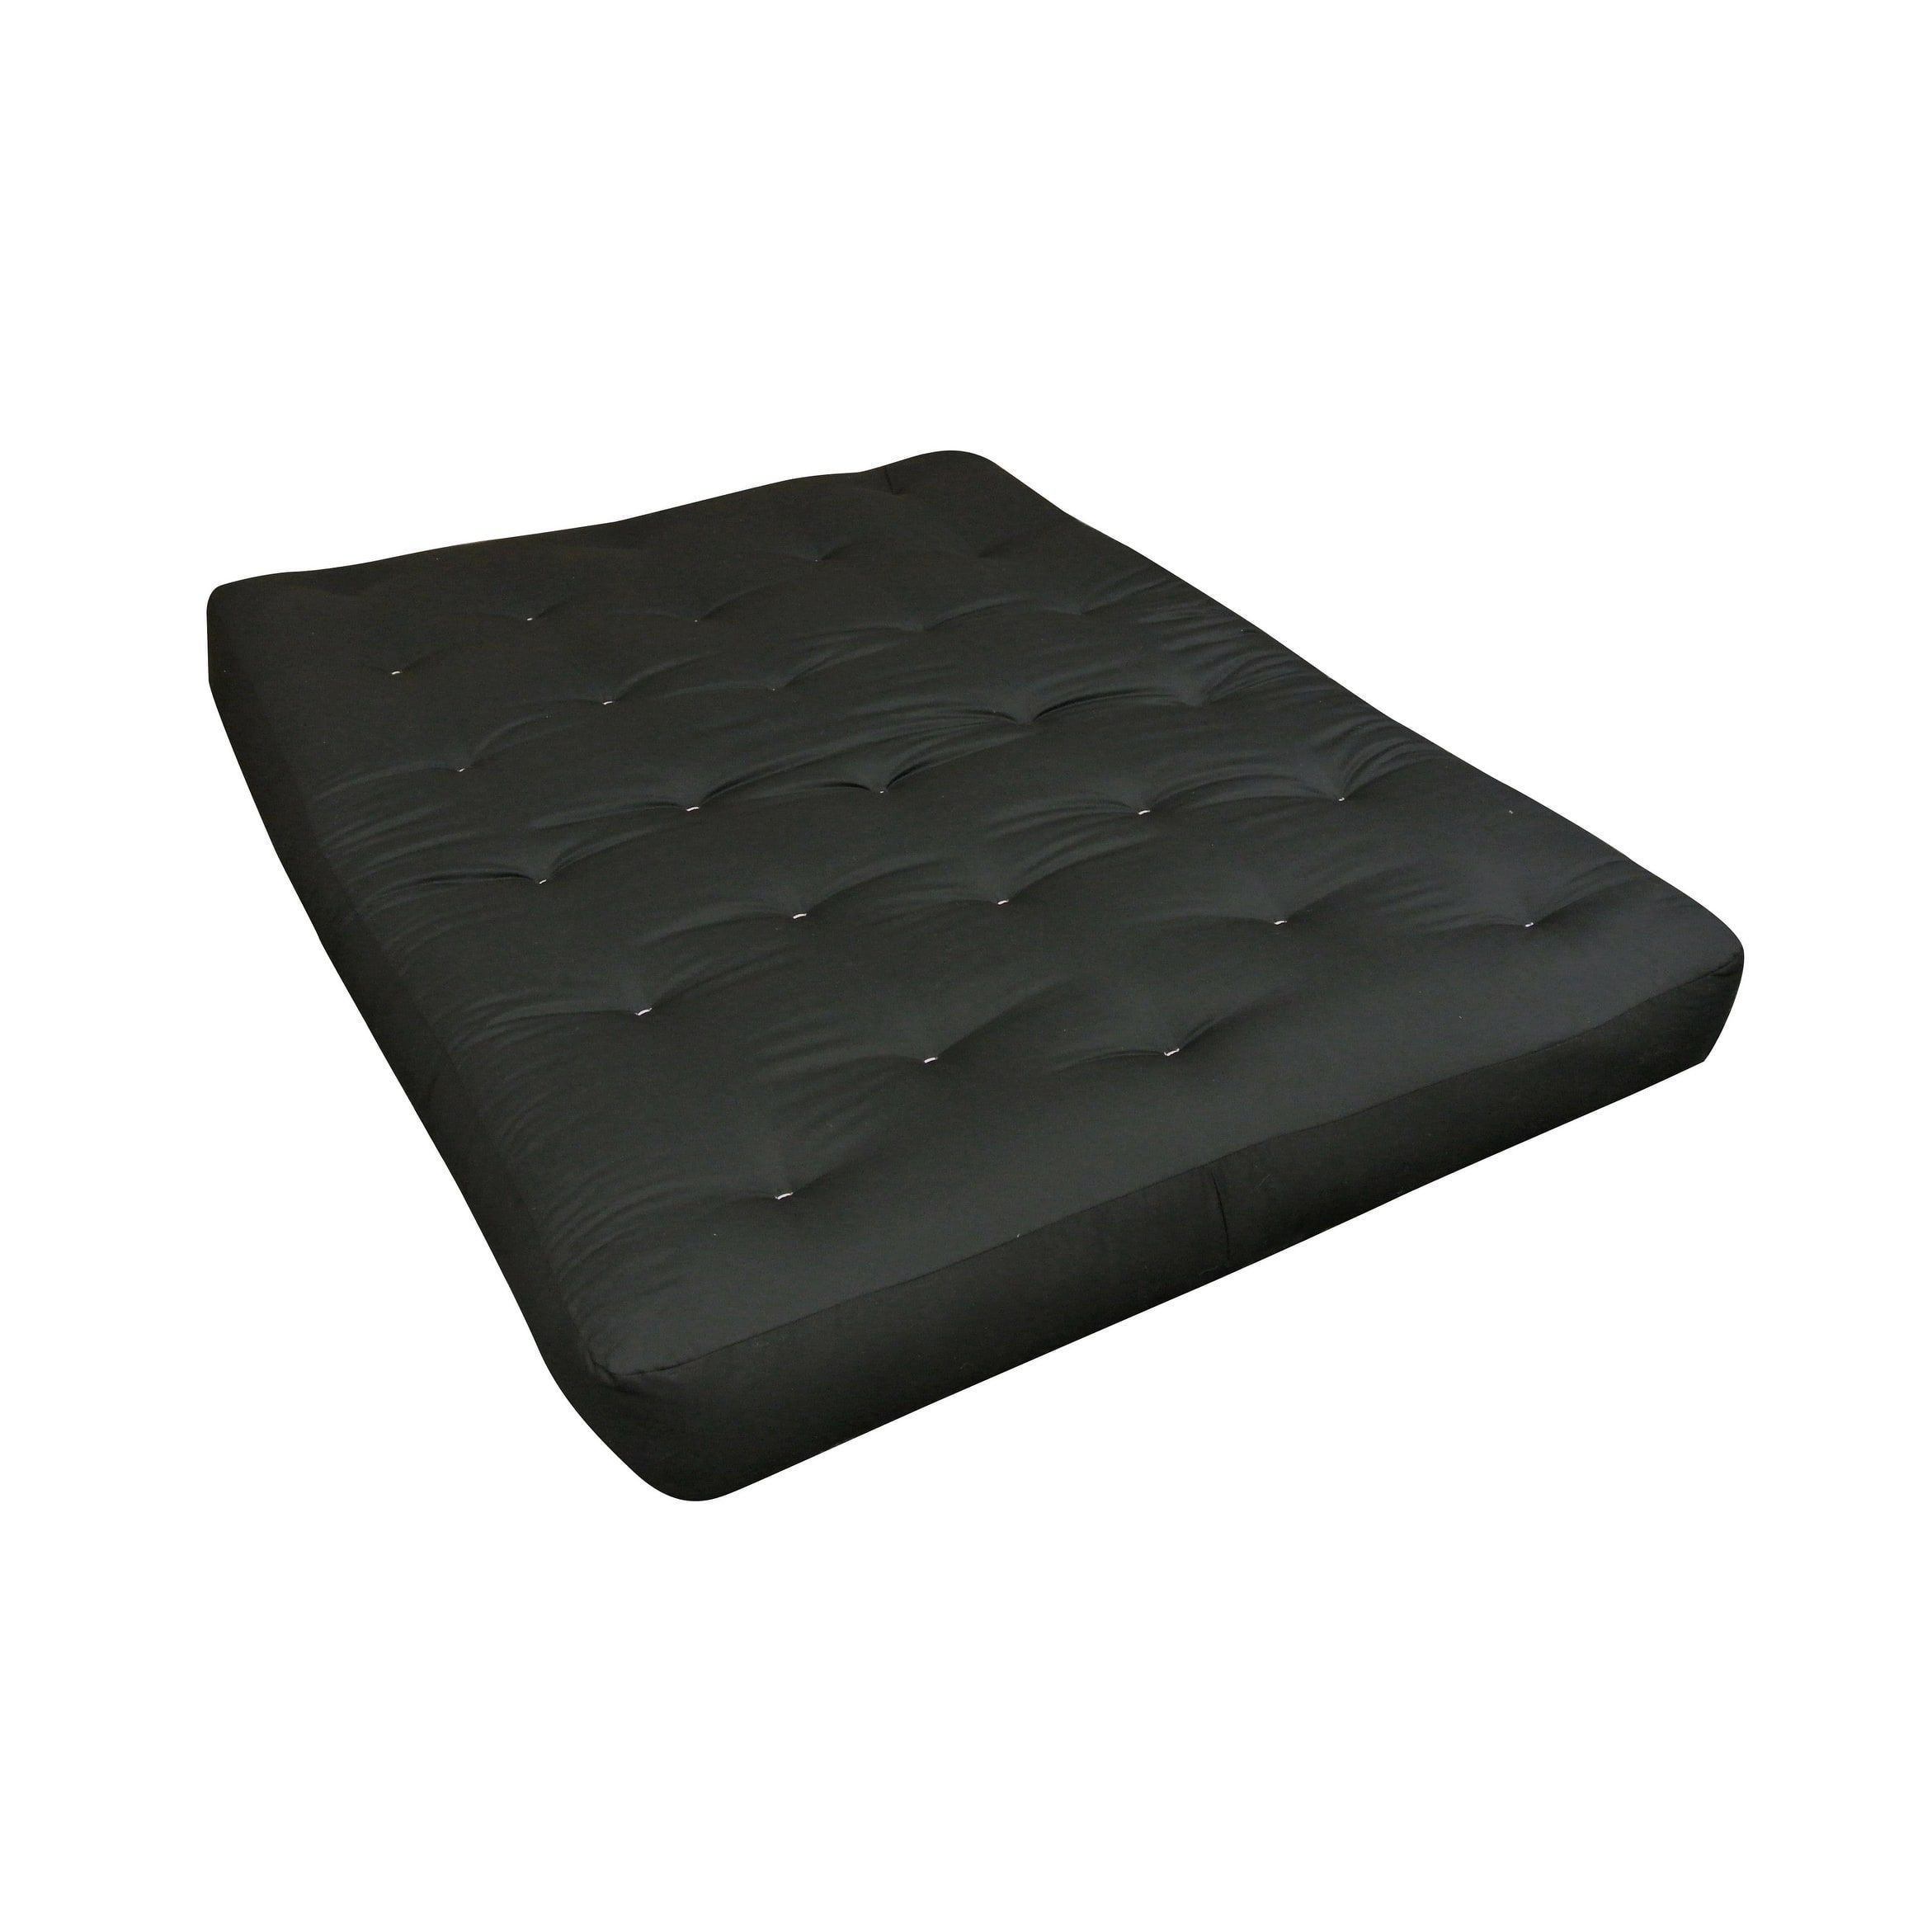 Comfortcoil Black Queen 9 Inch Duct Futon Mattress Polyester Blend Foam